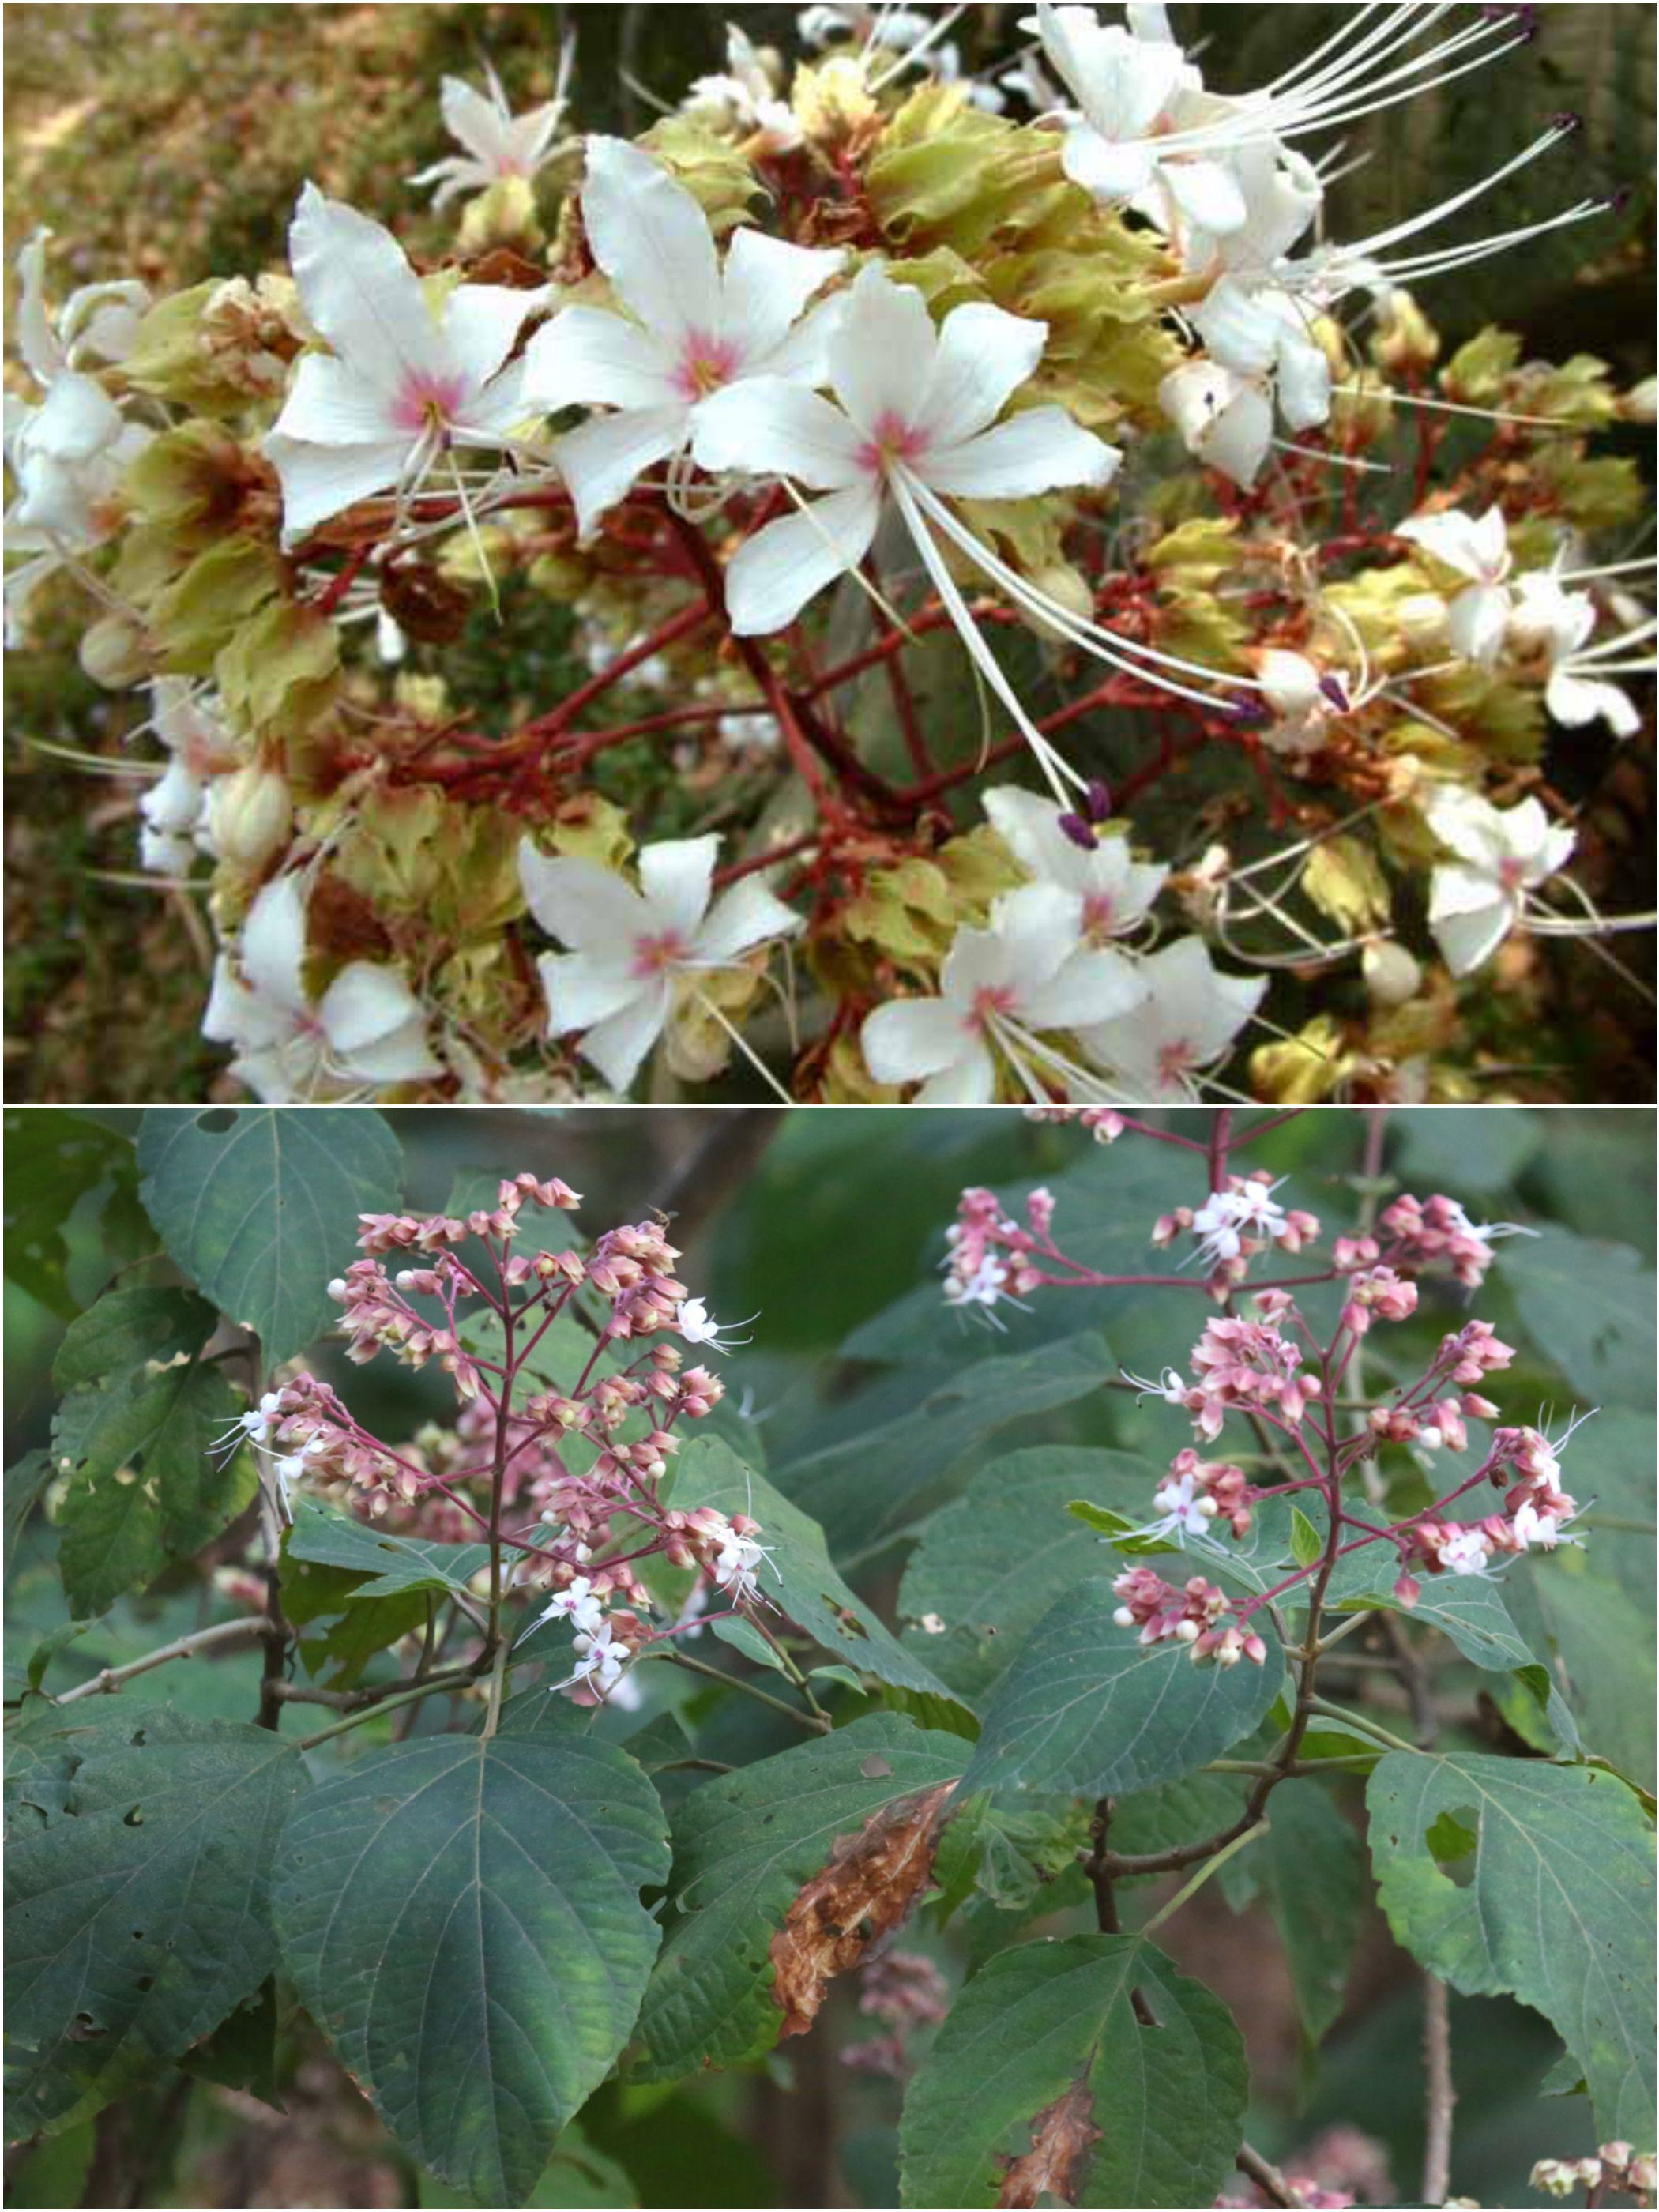 Ghetu Flower ঘ ট ফ ল ভ টফ ল Clerodendrum Infortunatum Flowers Floral Beautiful